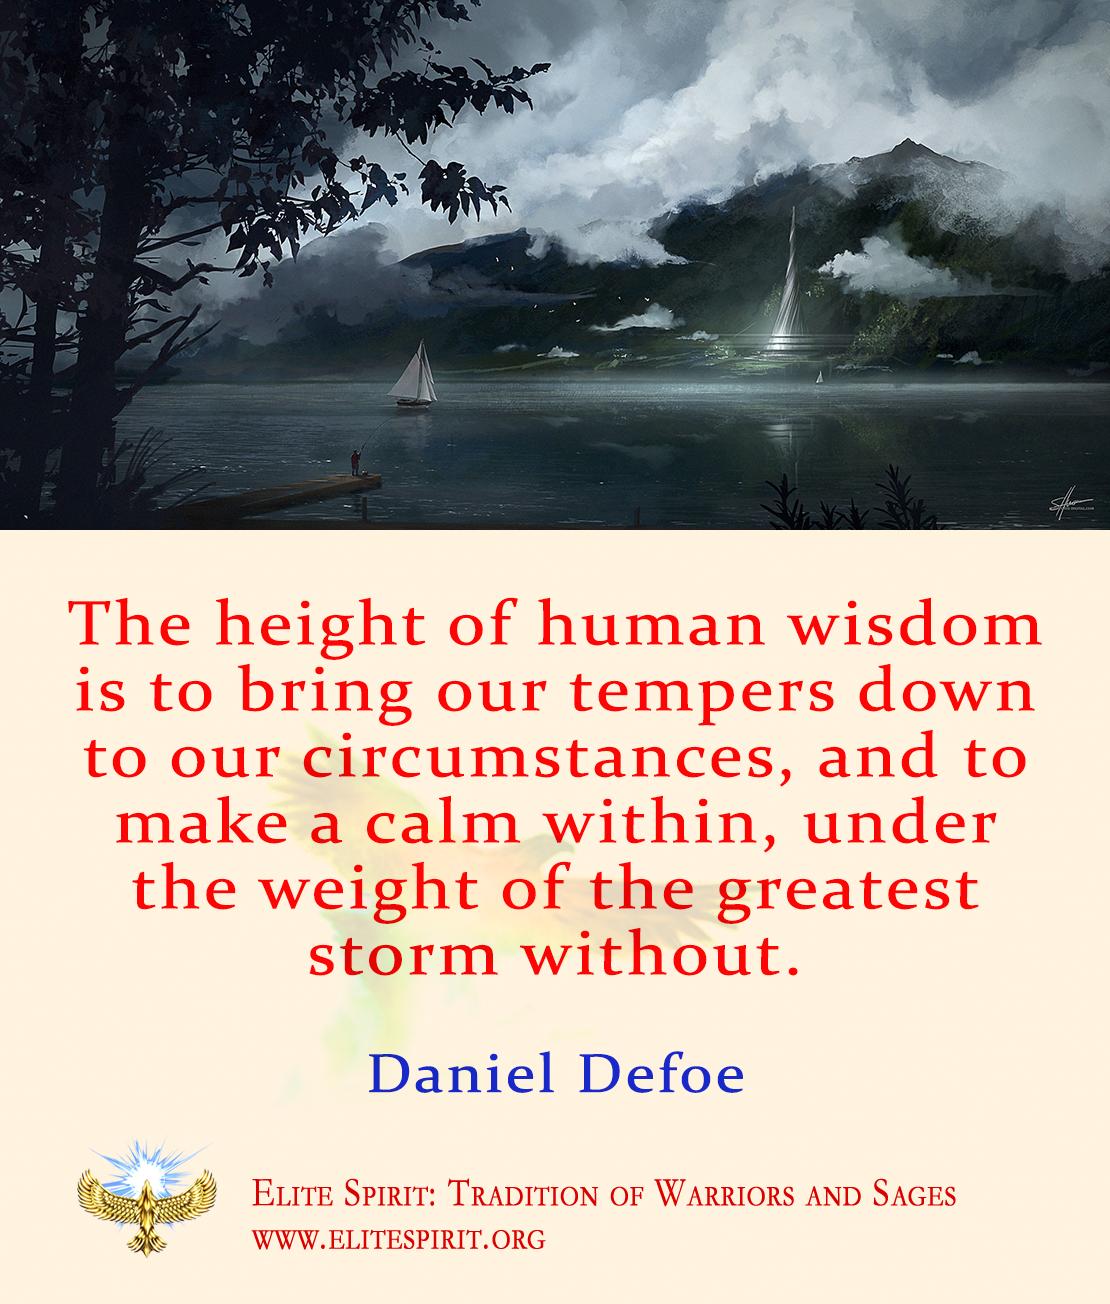 Daniel Defoe Daniel Defoe Warrior Quotes Storm Ship